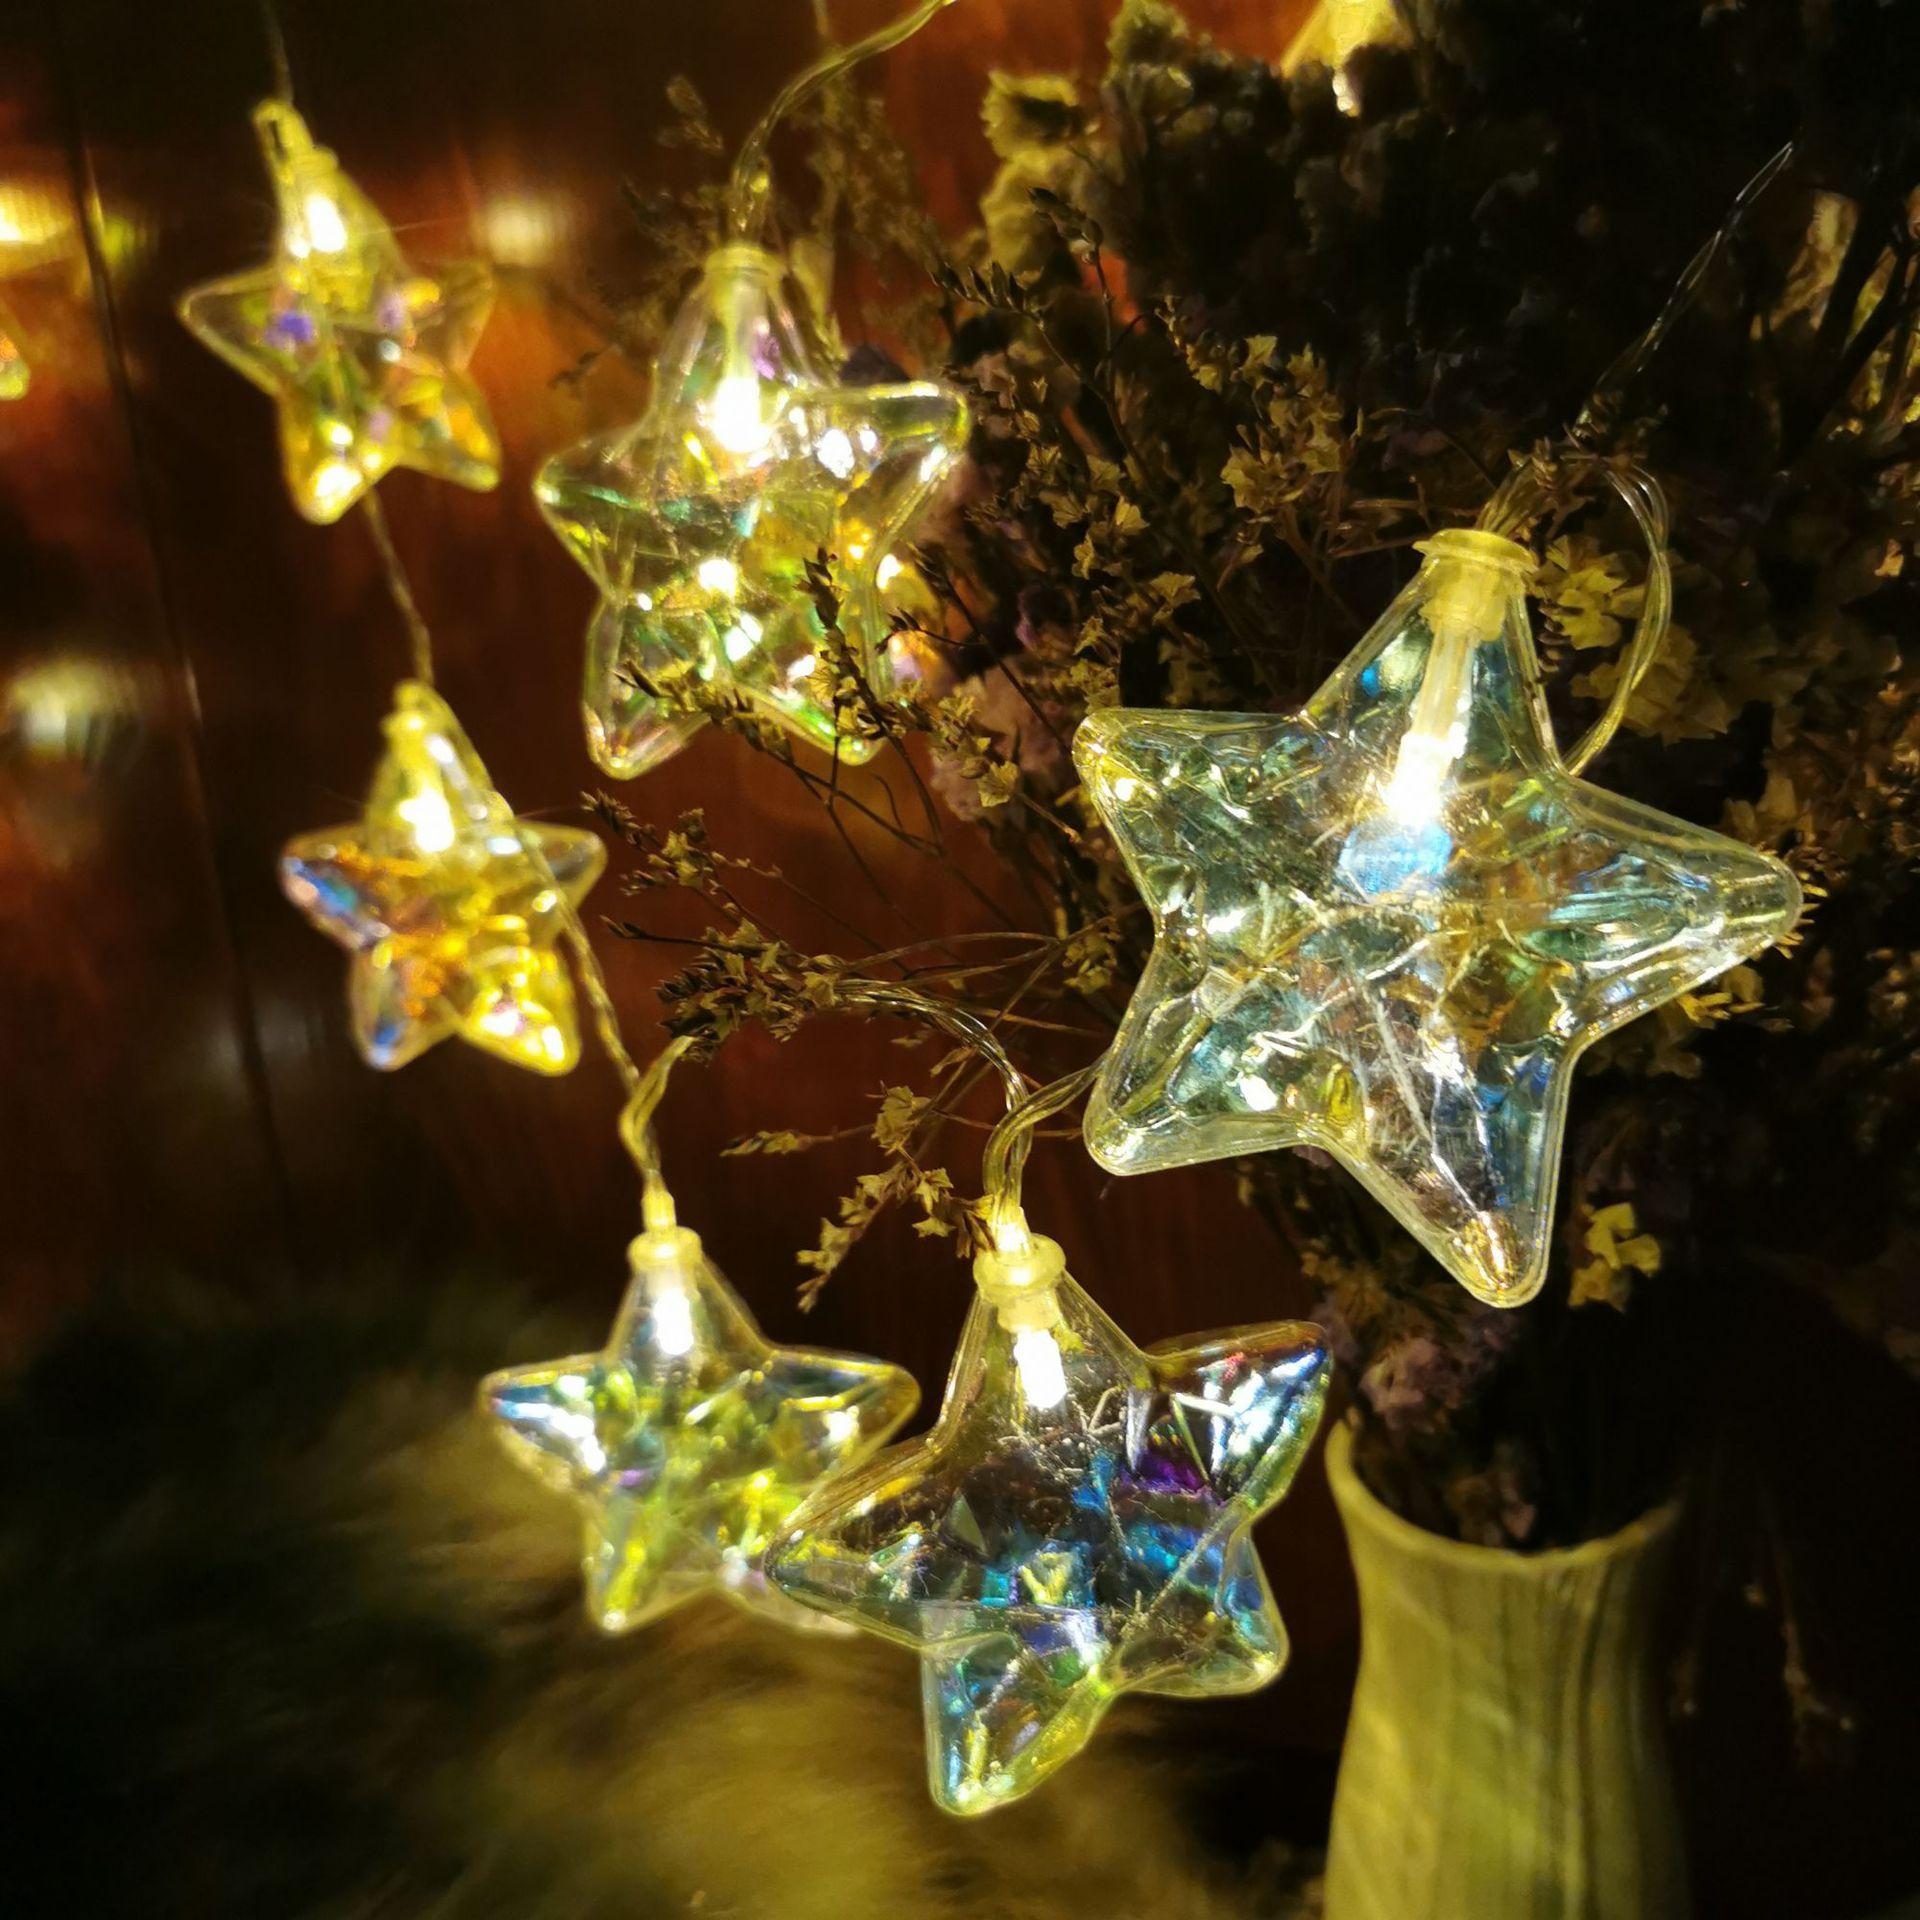 Led Five Pointed Star Light Seven Color Electroplate Star Light String Christmas Room Decoration Light Festival Color Light